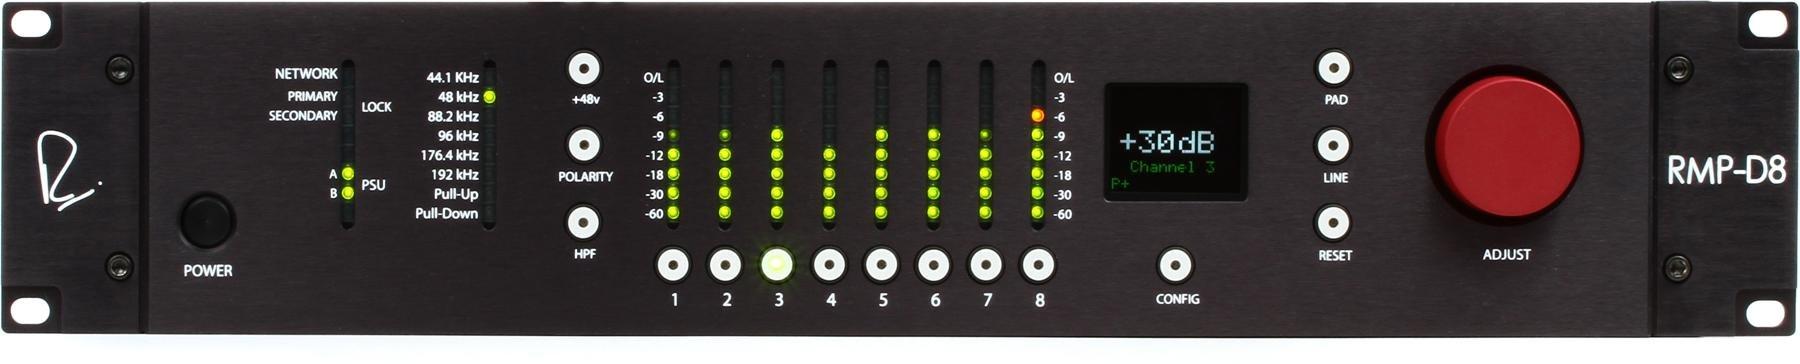 Rupert Neve Designs Rmp D8 Dante Remote Control Microphone Preamp Lowvoltagemicrophonepreamp Preamplifier Audiocircuit Image 1